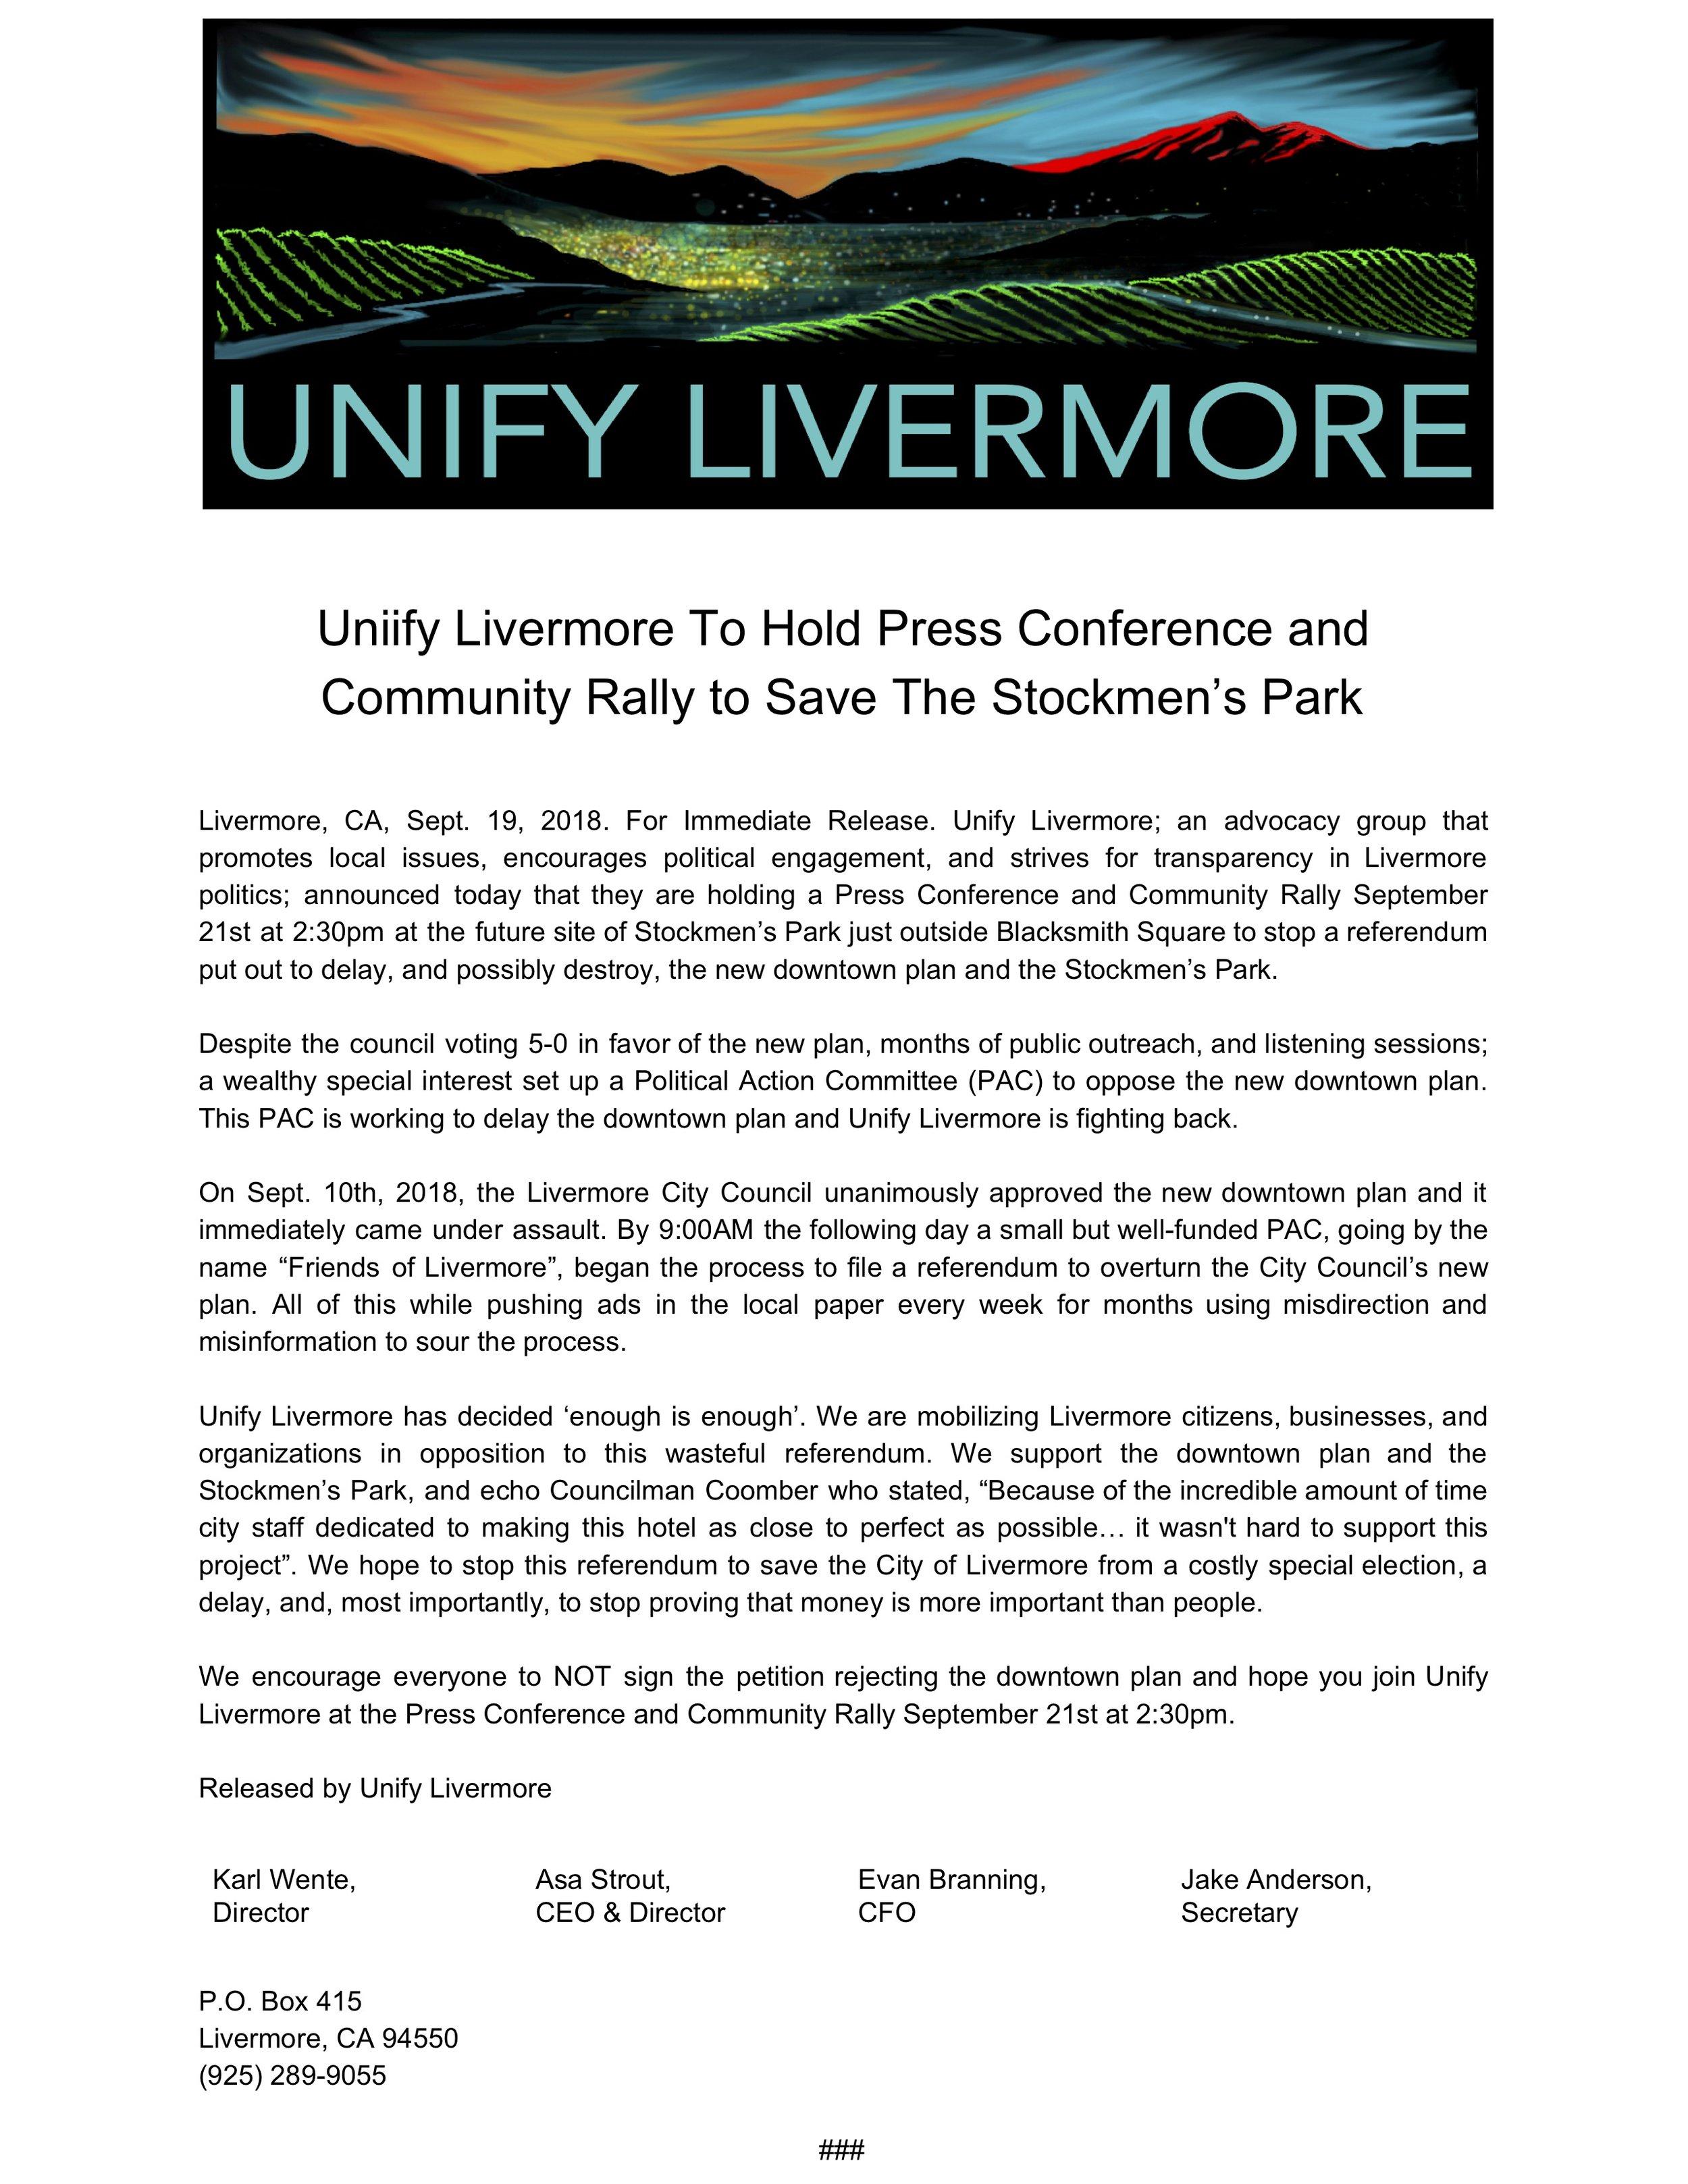 Unify Livermore - Press Release Sept 19.jpg